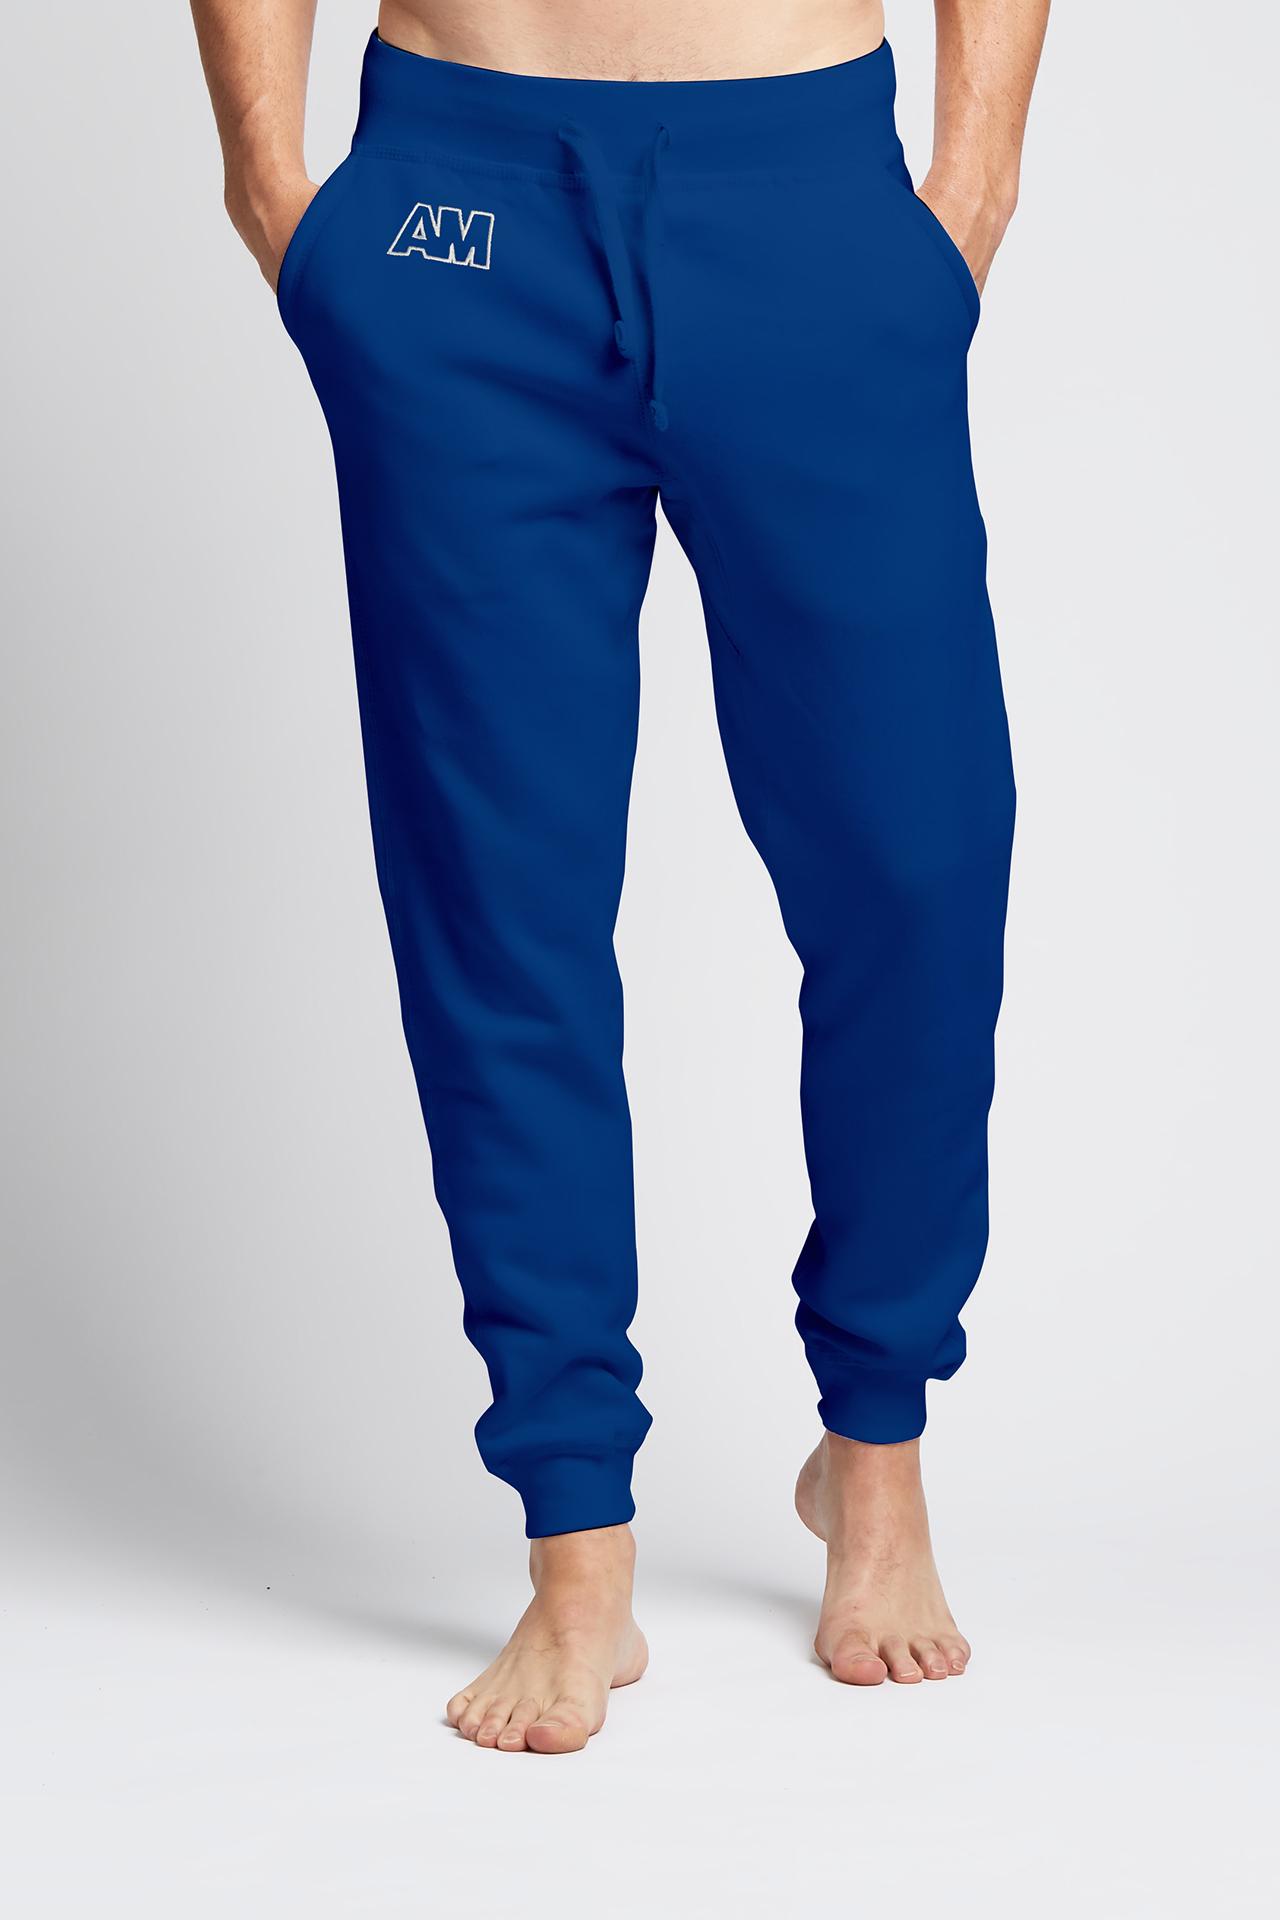 AM Jogger Sweatpants in Royal Blue